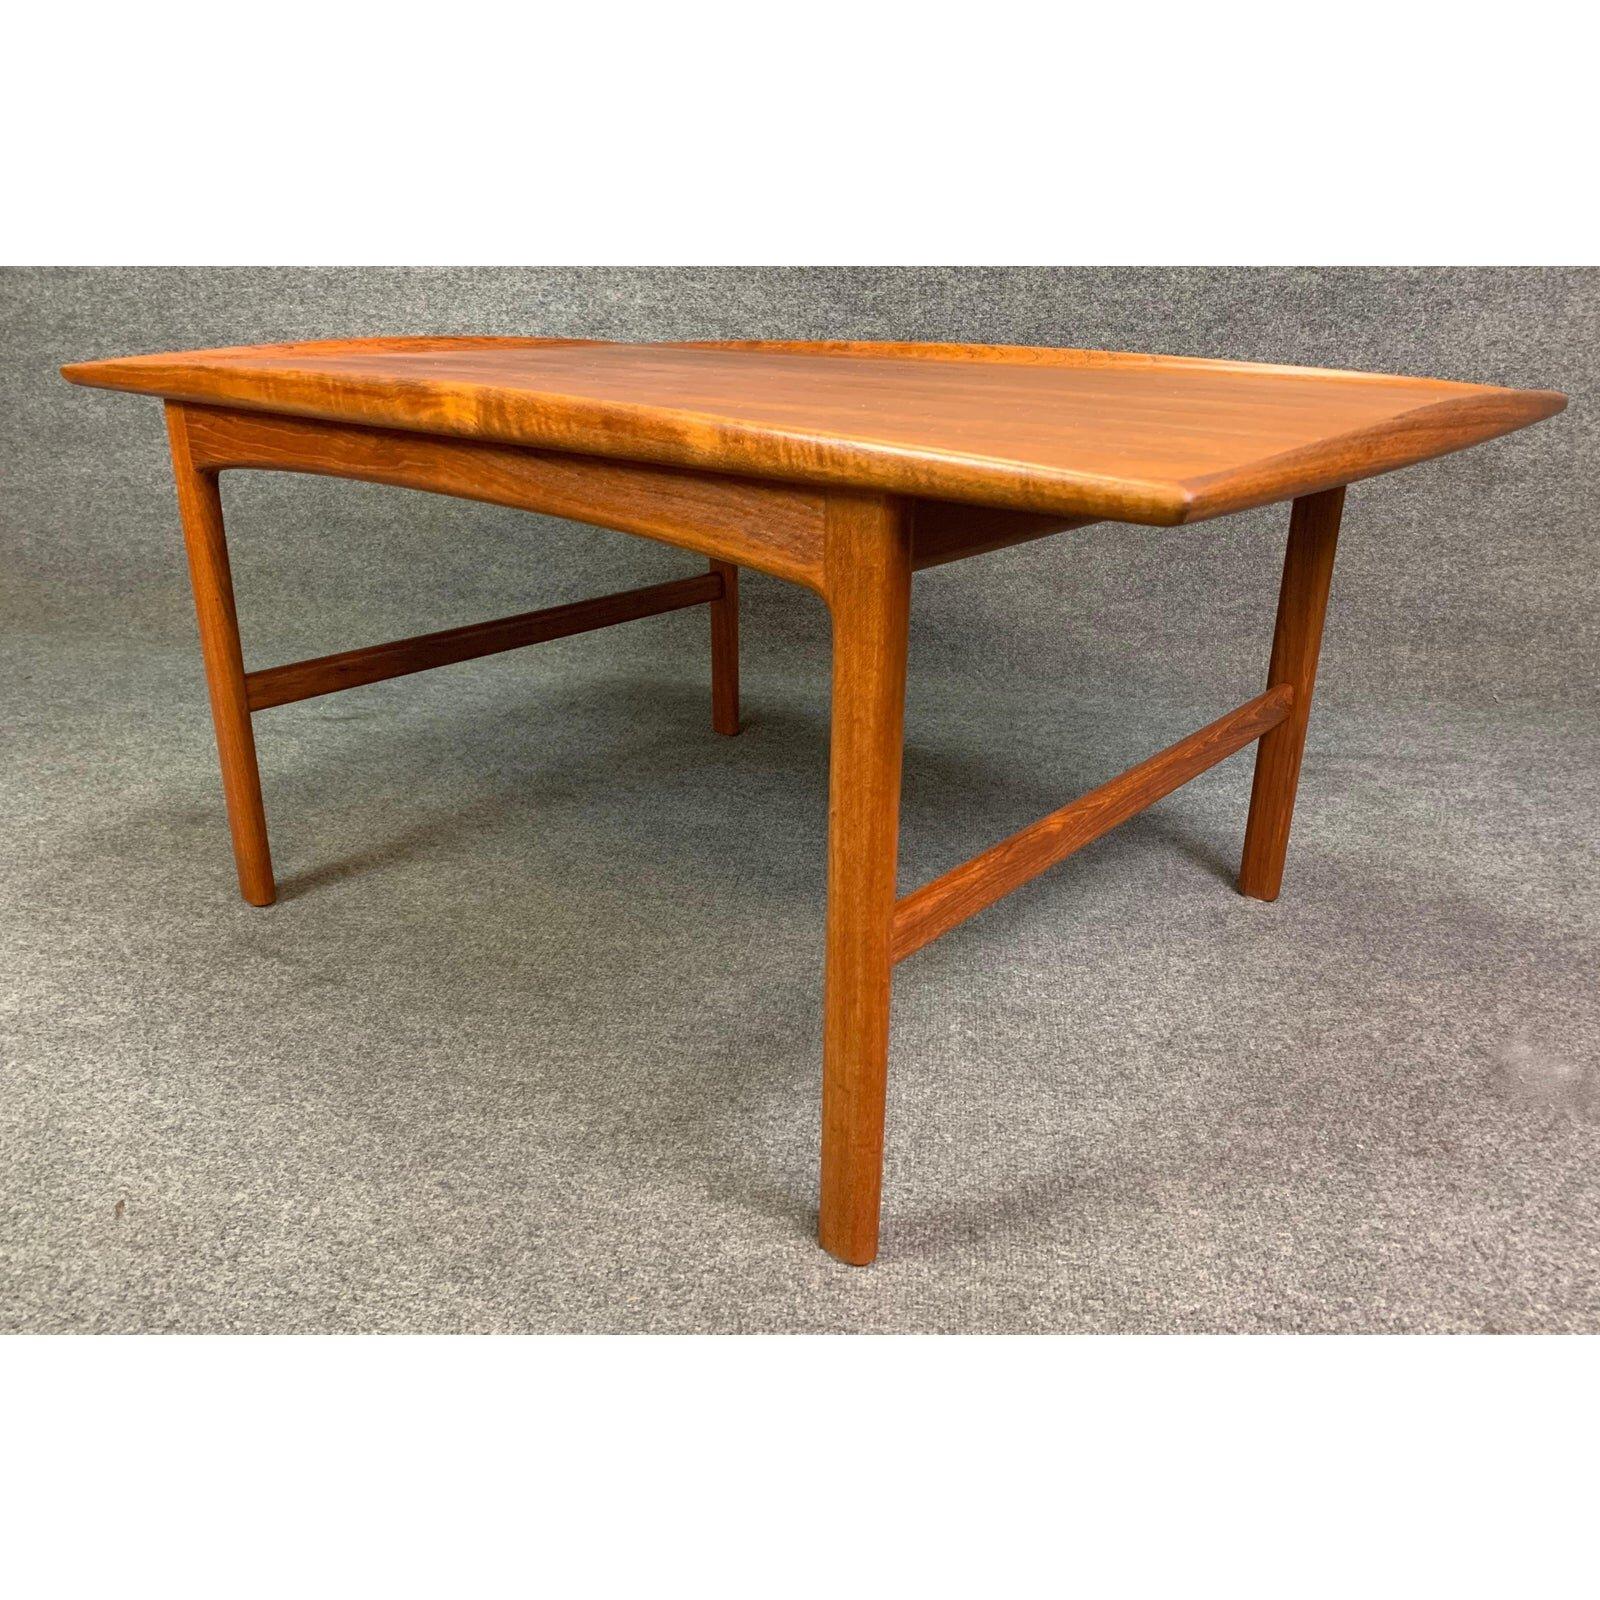 Vintage Scandinavian Mid Century Modern Teak Frisco Coffee Table